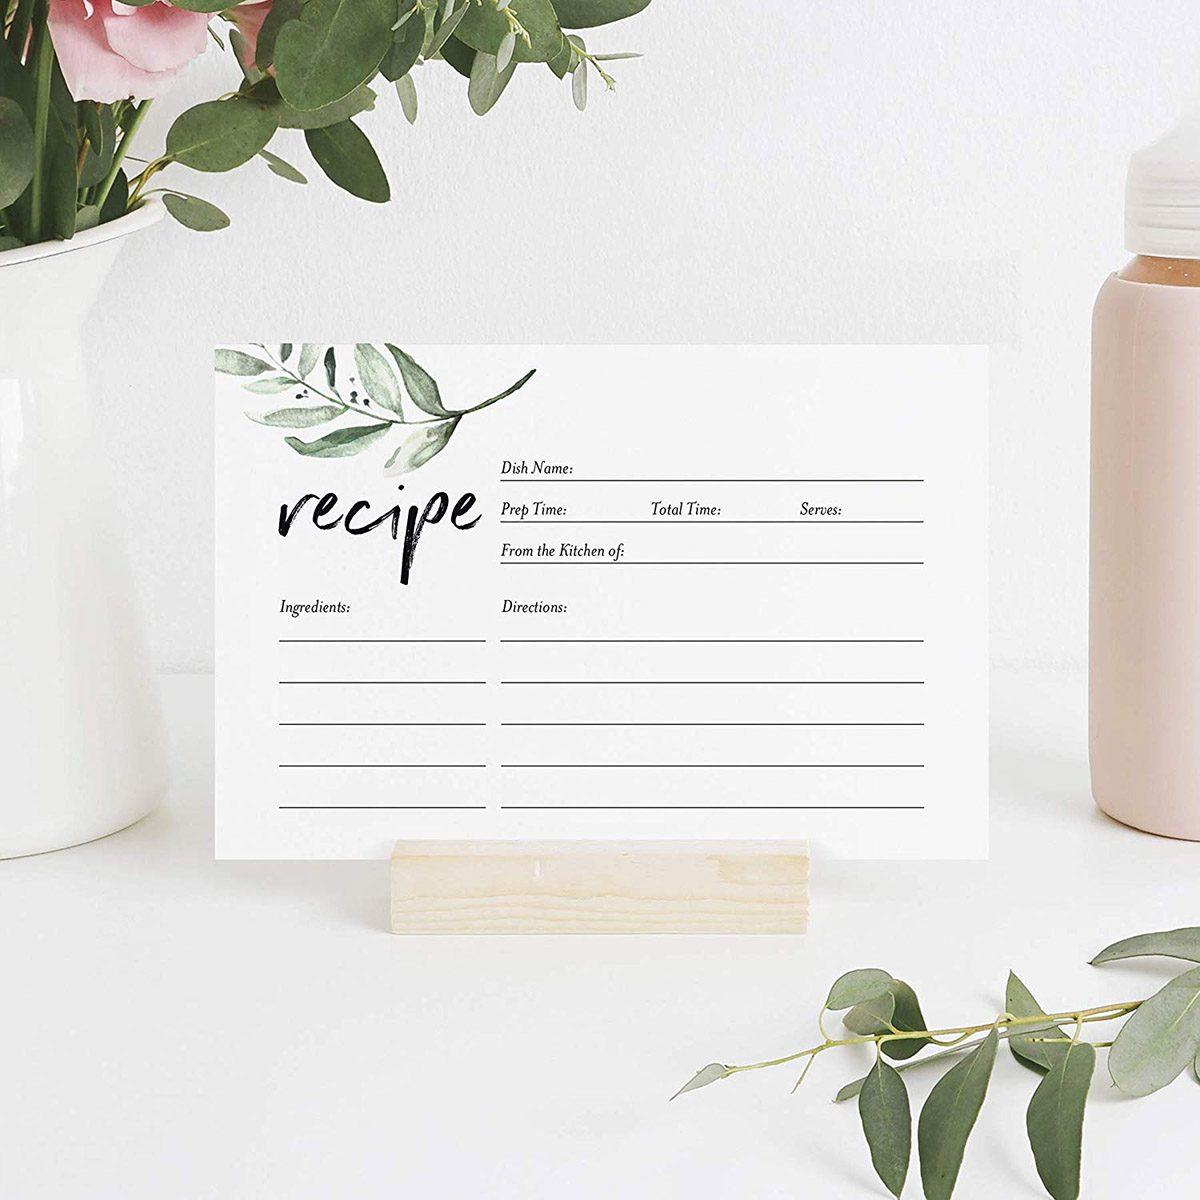 15 Hostess Gift Ideas (That Aren\'t a Bottle of Wine) | Taste of Home